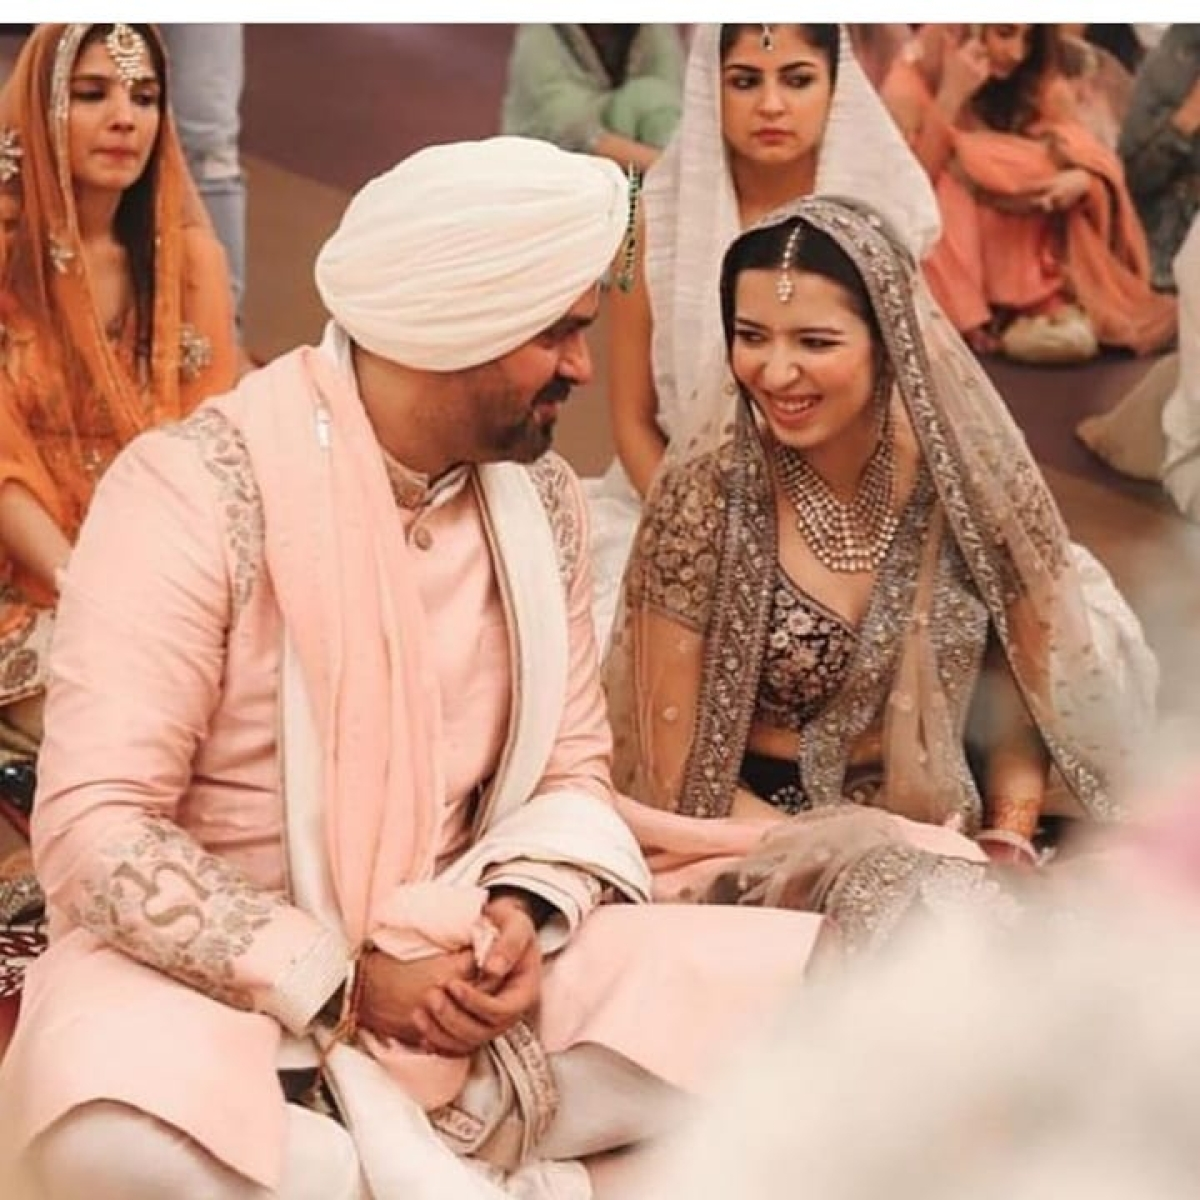 Harman Baweja ties the knot with Sasha Ramchandani: Shilpa Shetty, Raj Kundra share fun-filled videos, pics